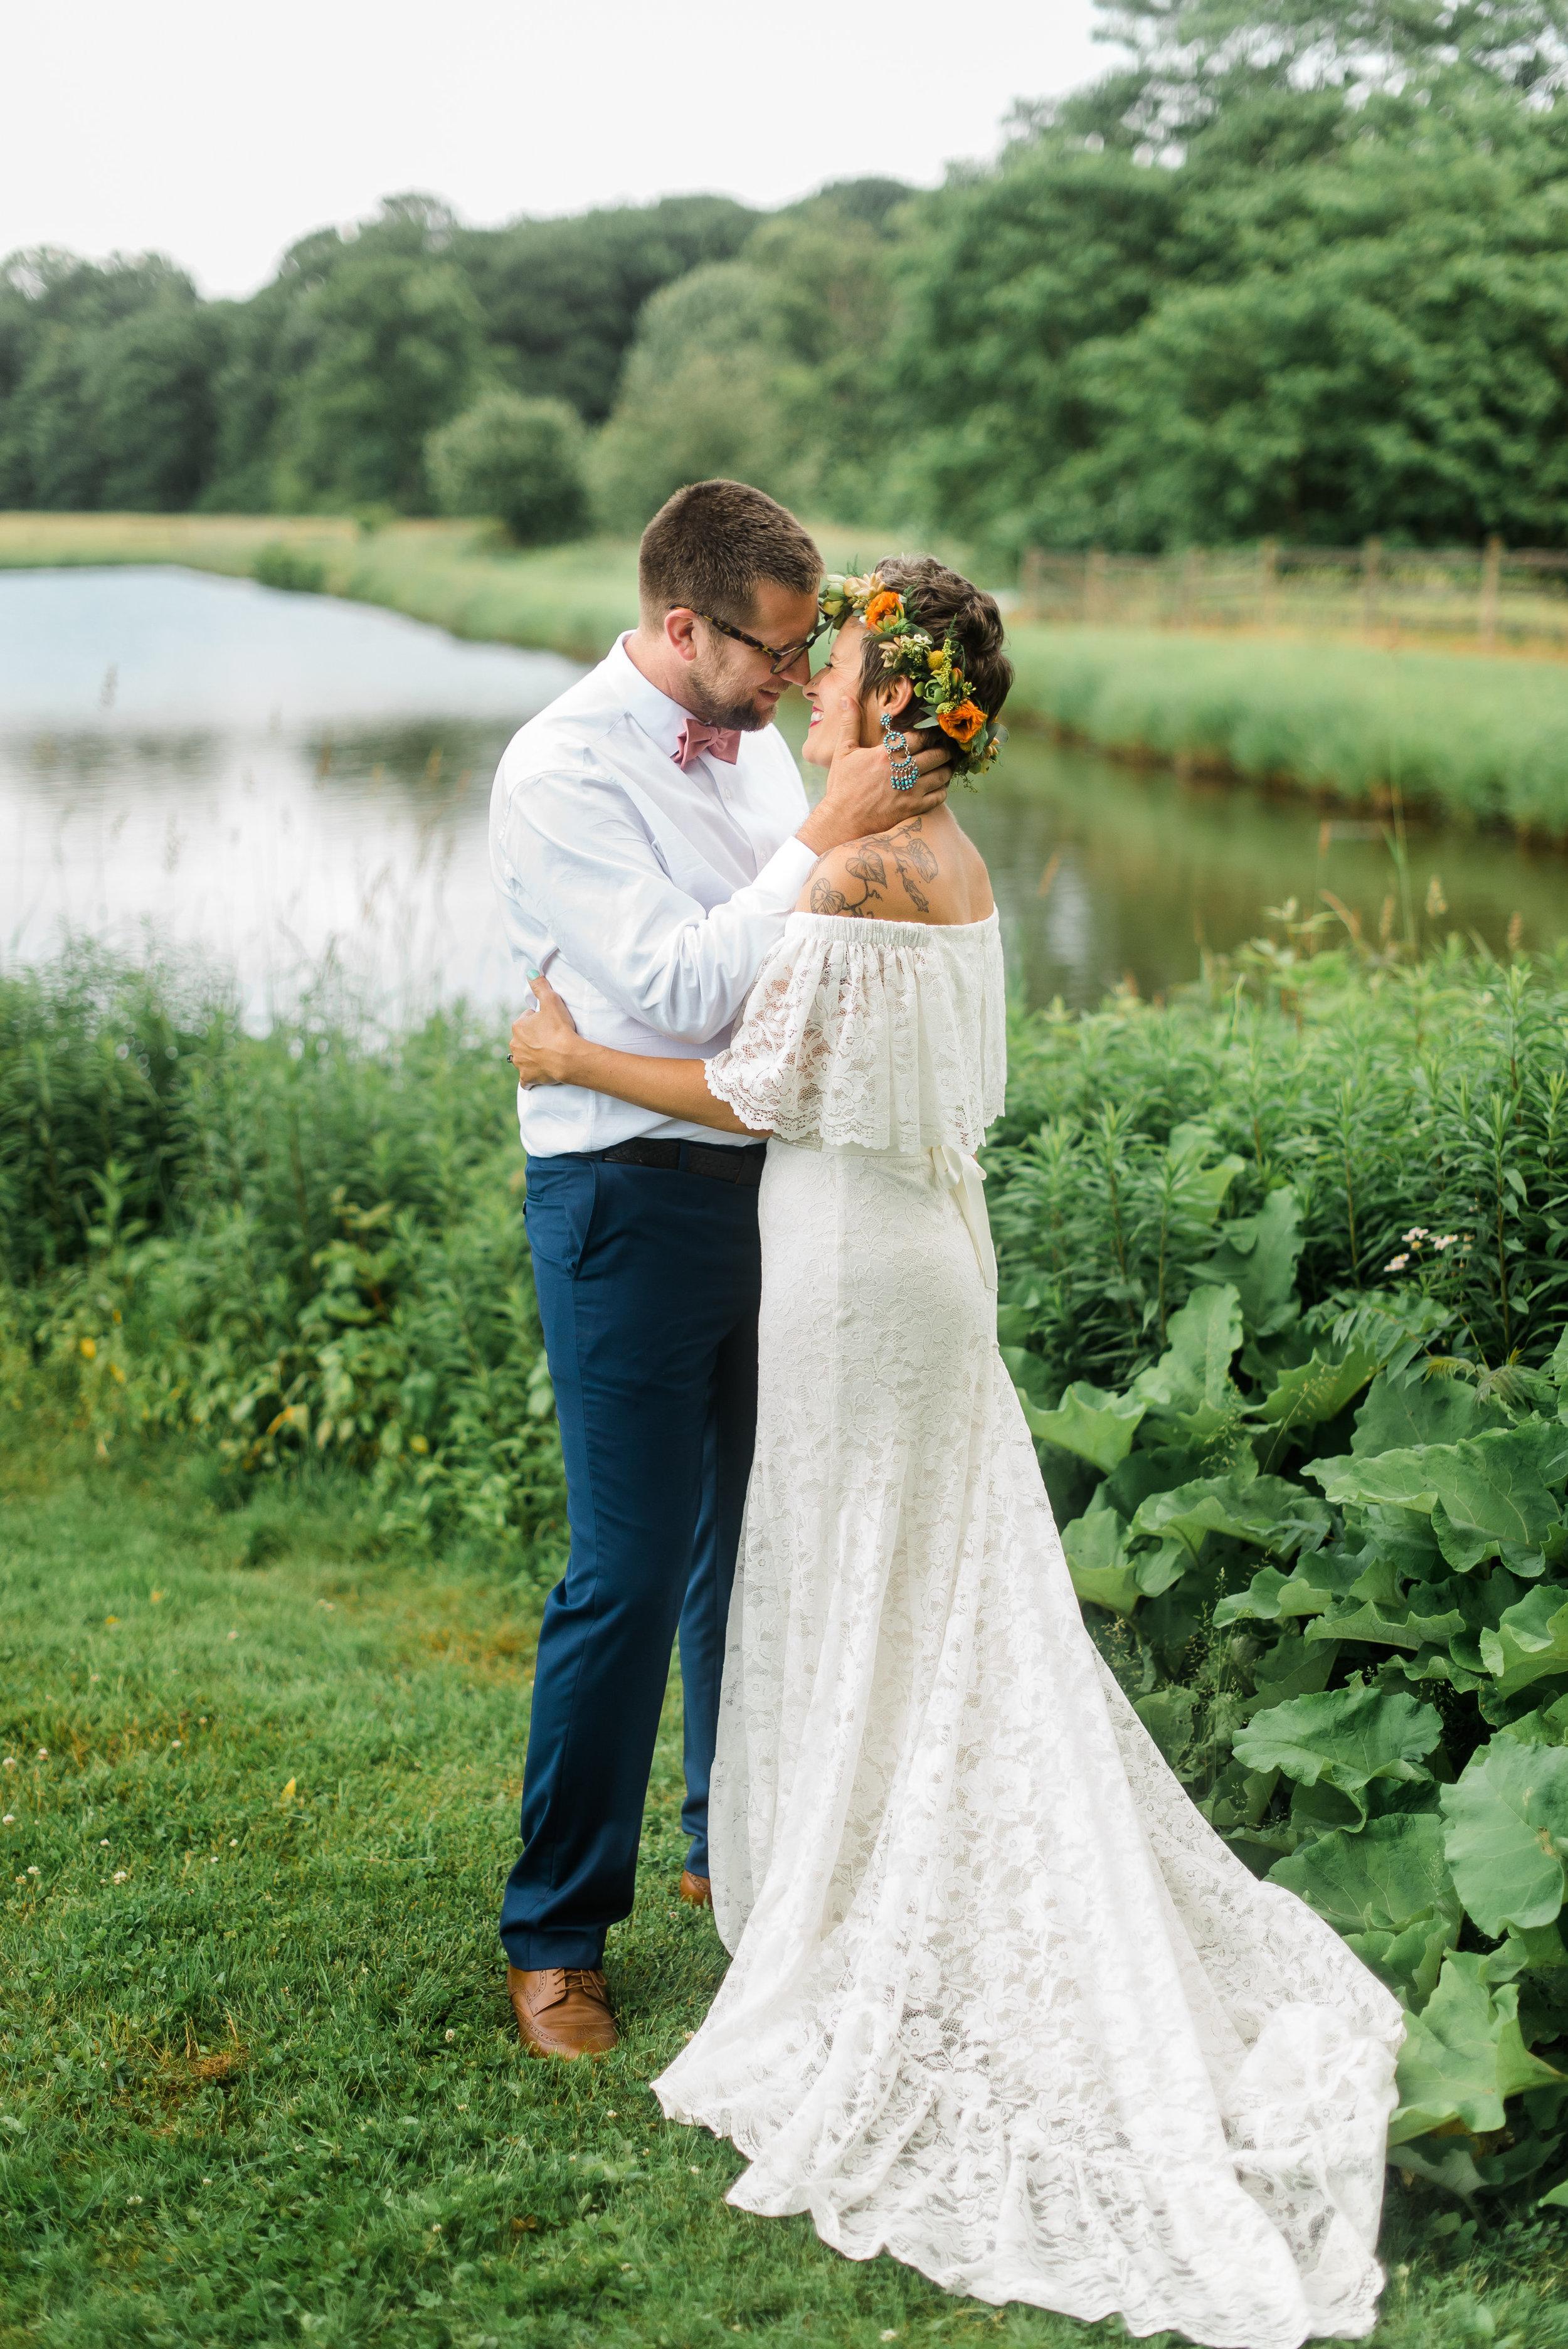 pittsburgh-wedding-photographer-armstrongfarms-eclectic-offbeat-boho0147.jpg